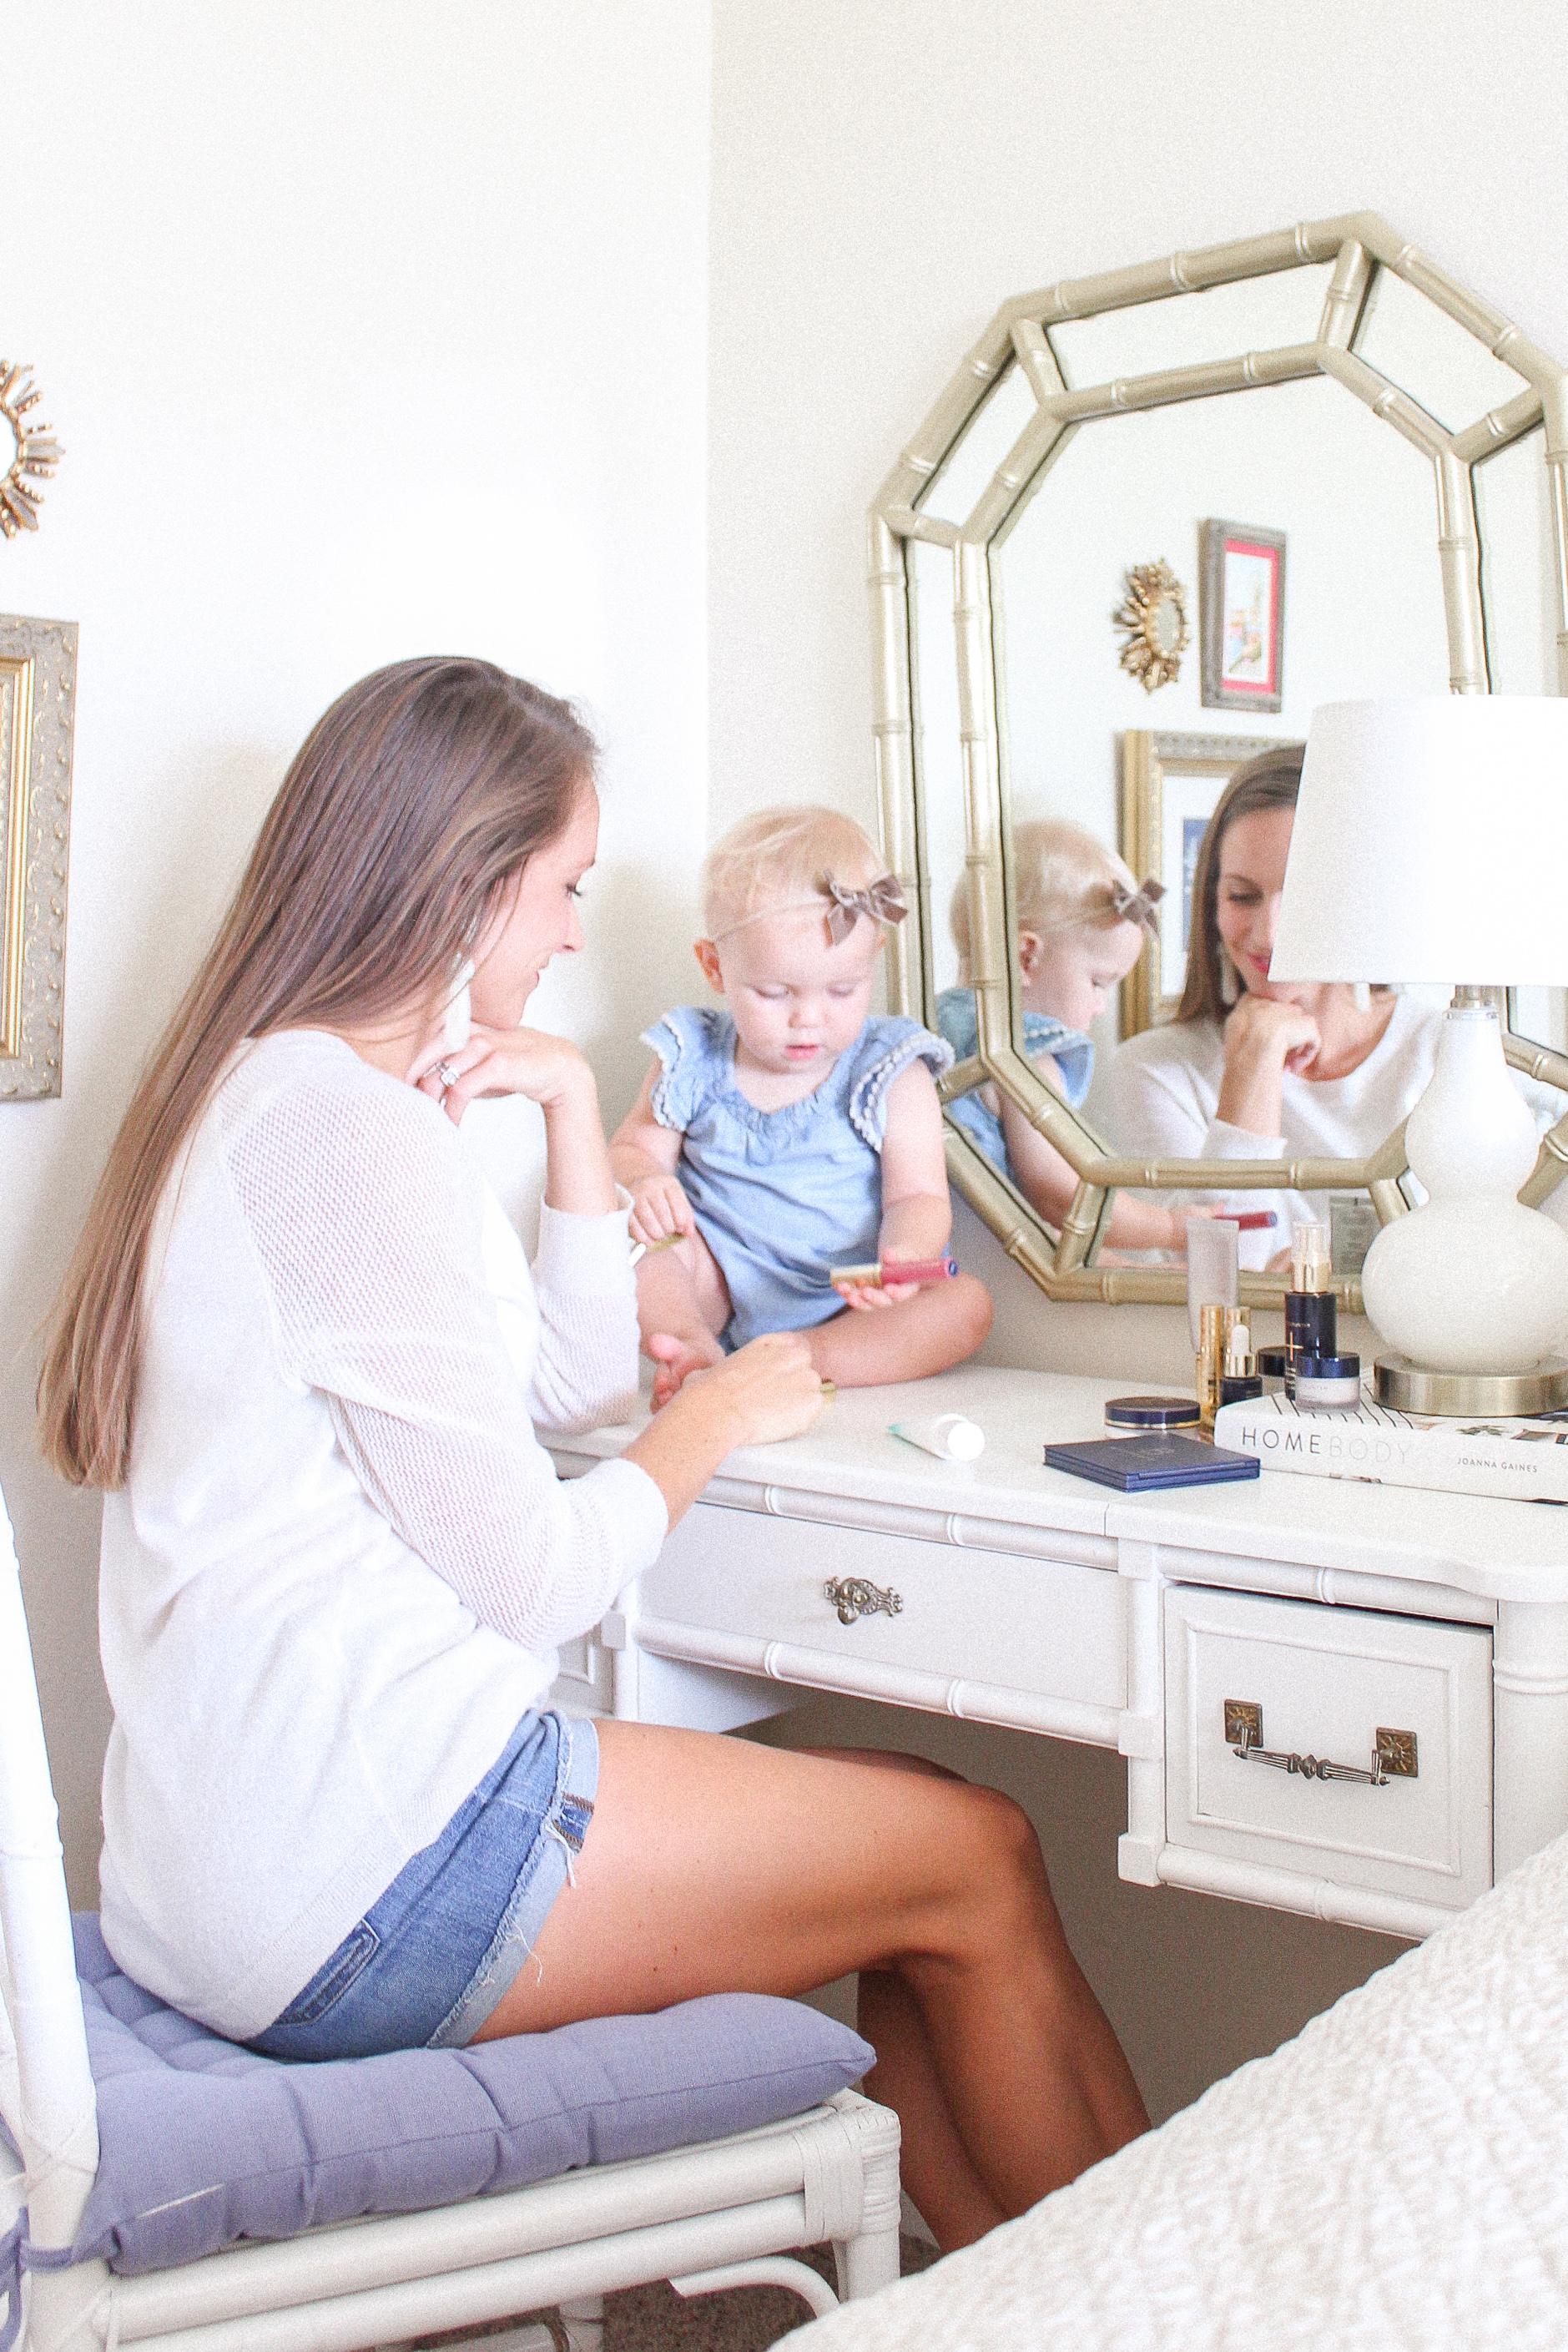 beautycounter - clean beauty - safer beauty - best beautycounter products - beautycounter skin care - beautycounter makeup - beautycounter sale